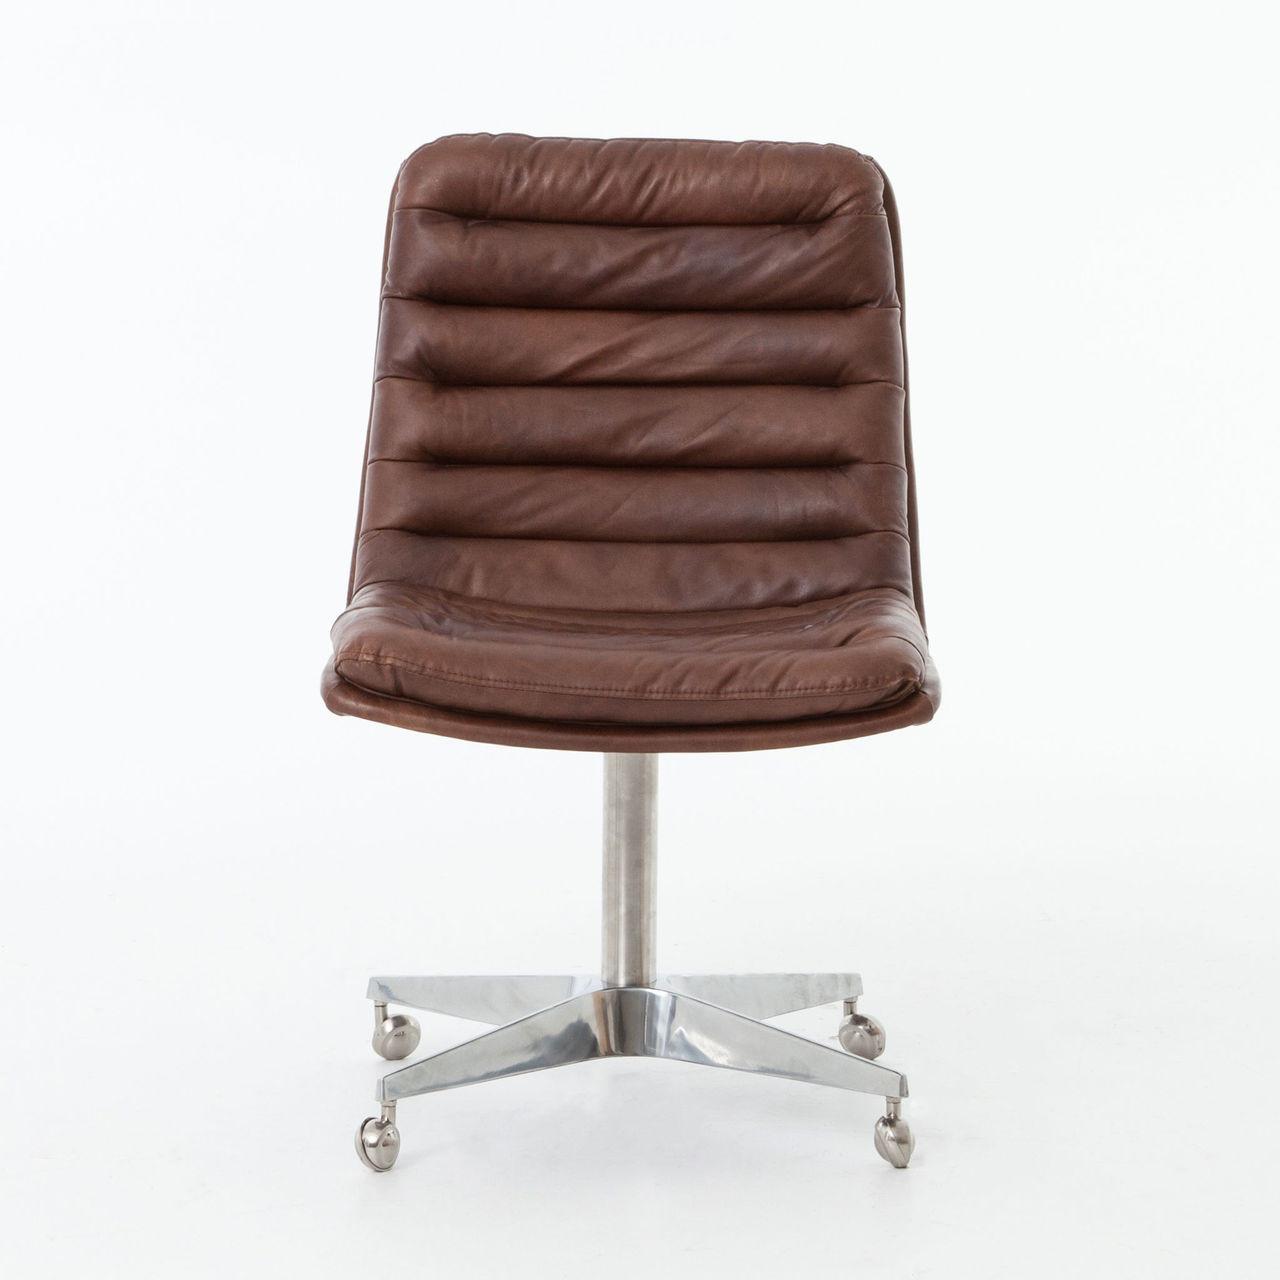 distressed leather desk chair steel keychain malibu whiskey office zin home